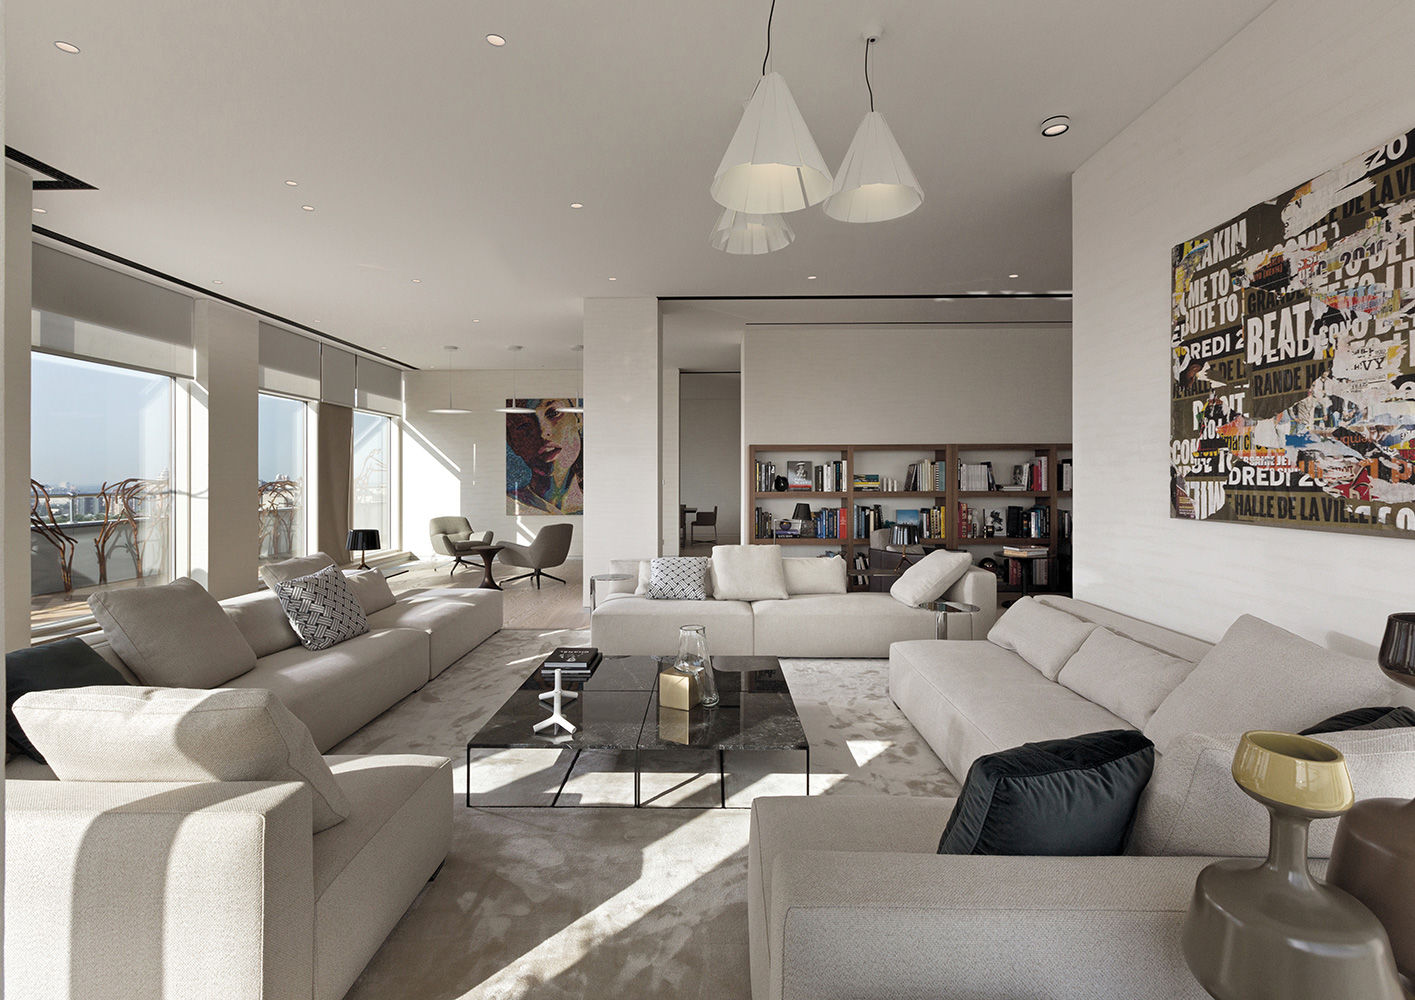 Kiew penthouse interiors & contract de